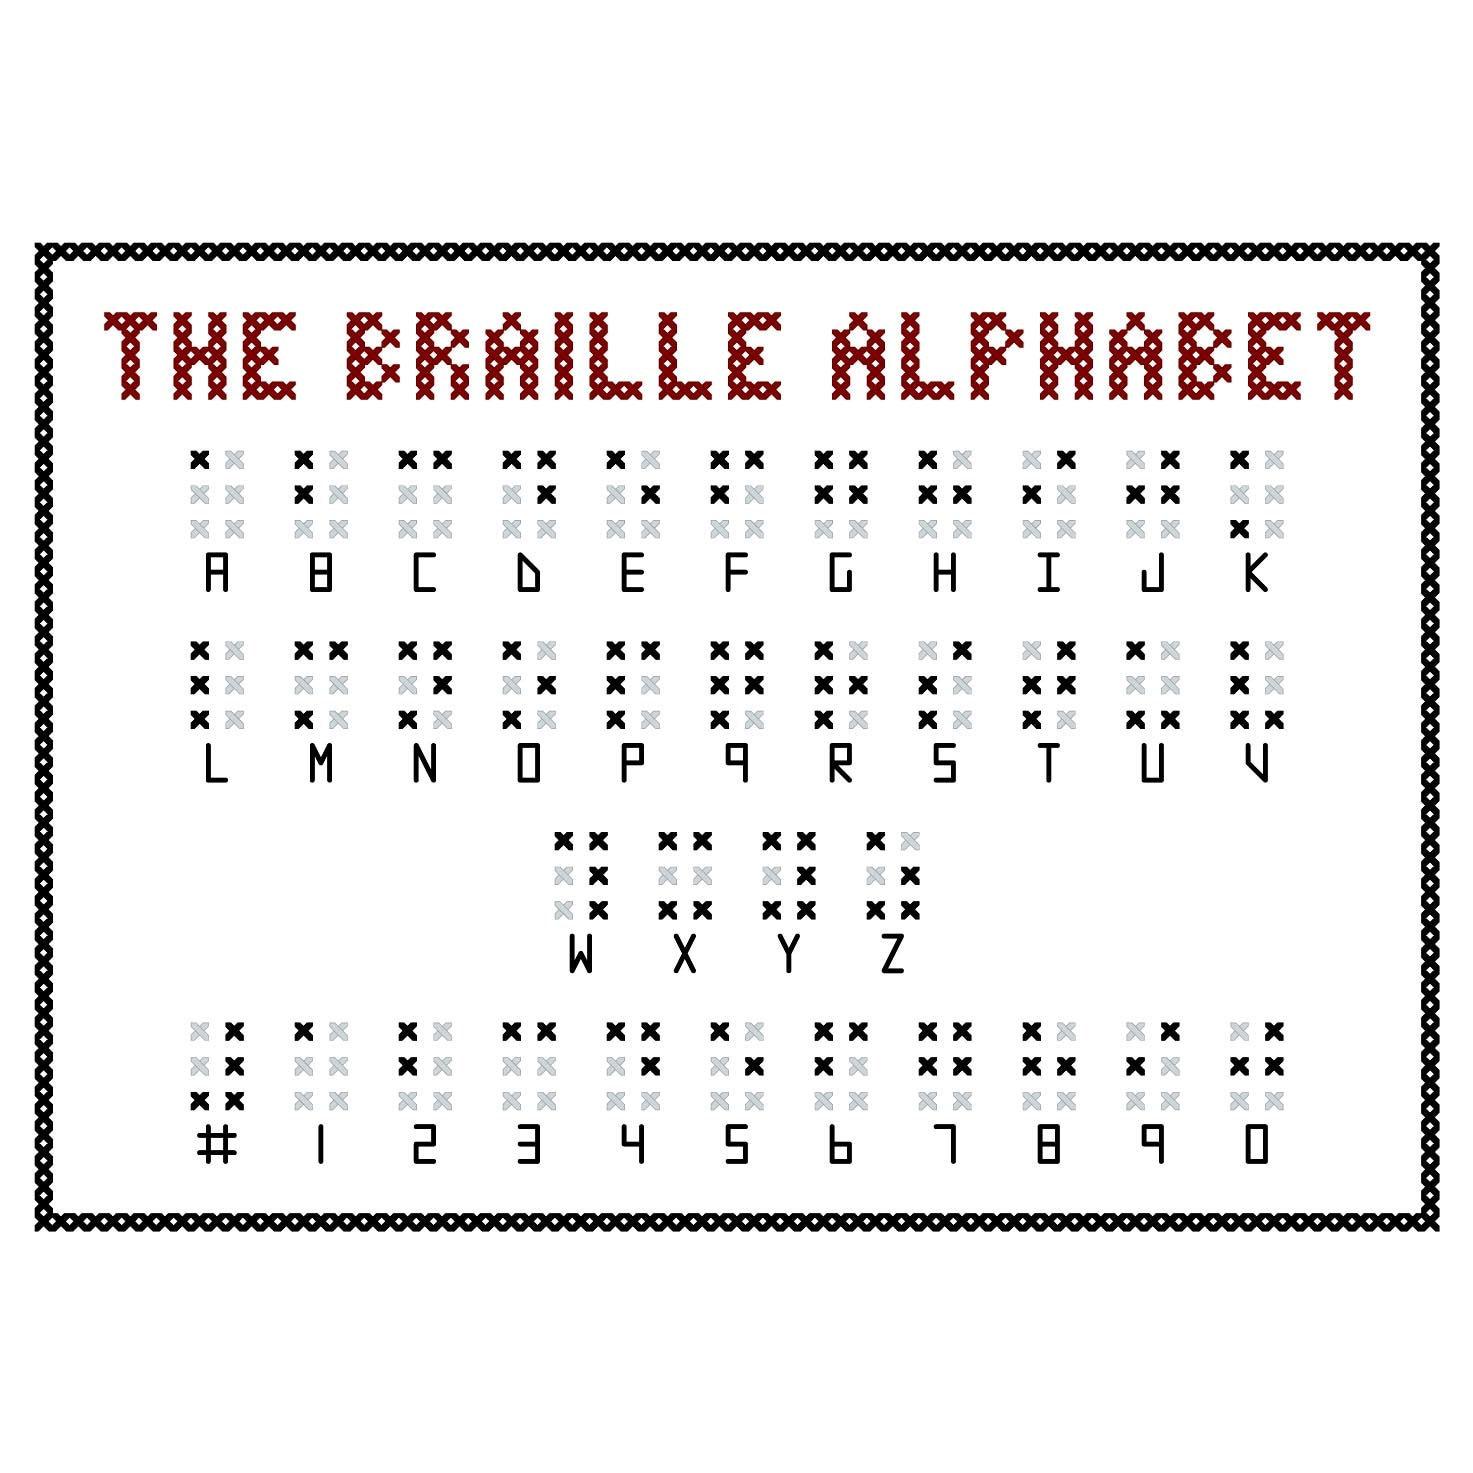 BRAILLE ALPHABET Cross Stitch Sampler Pattern by